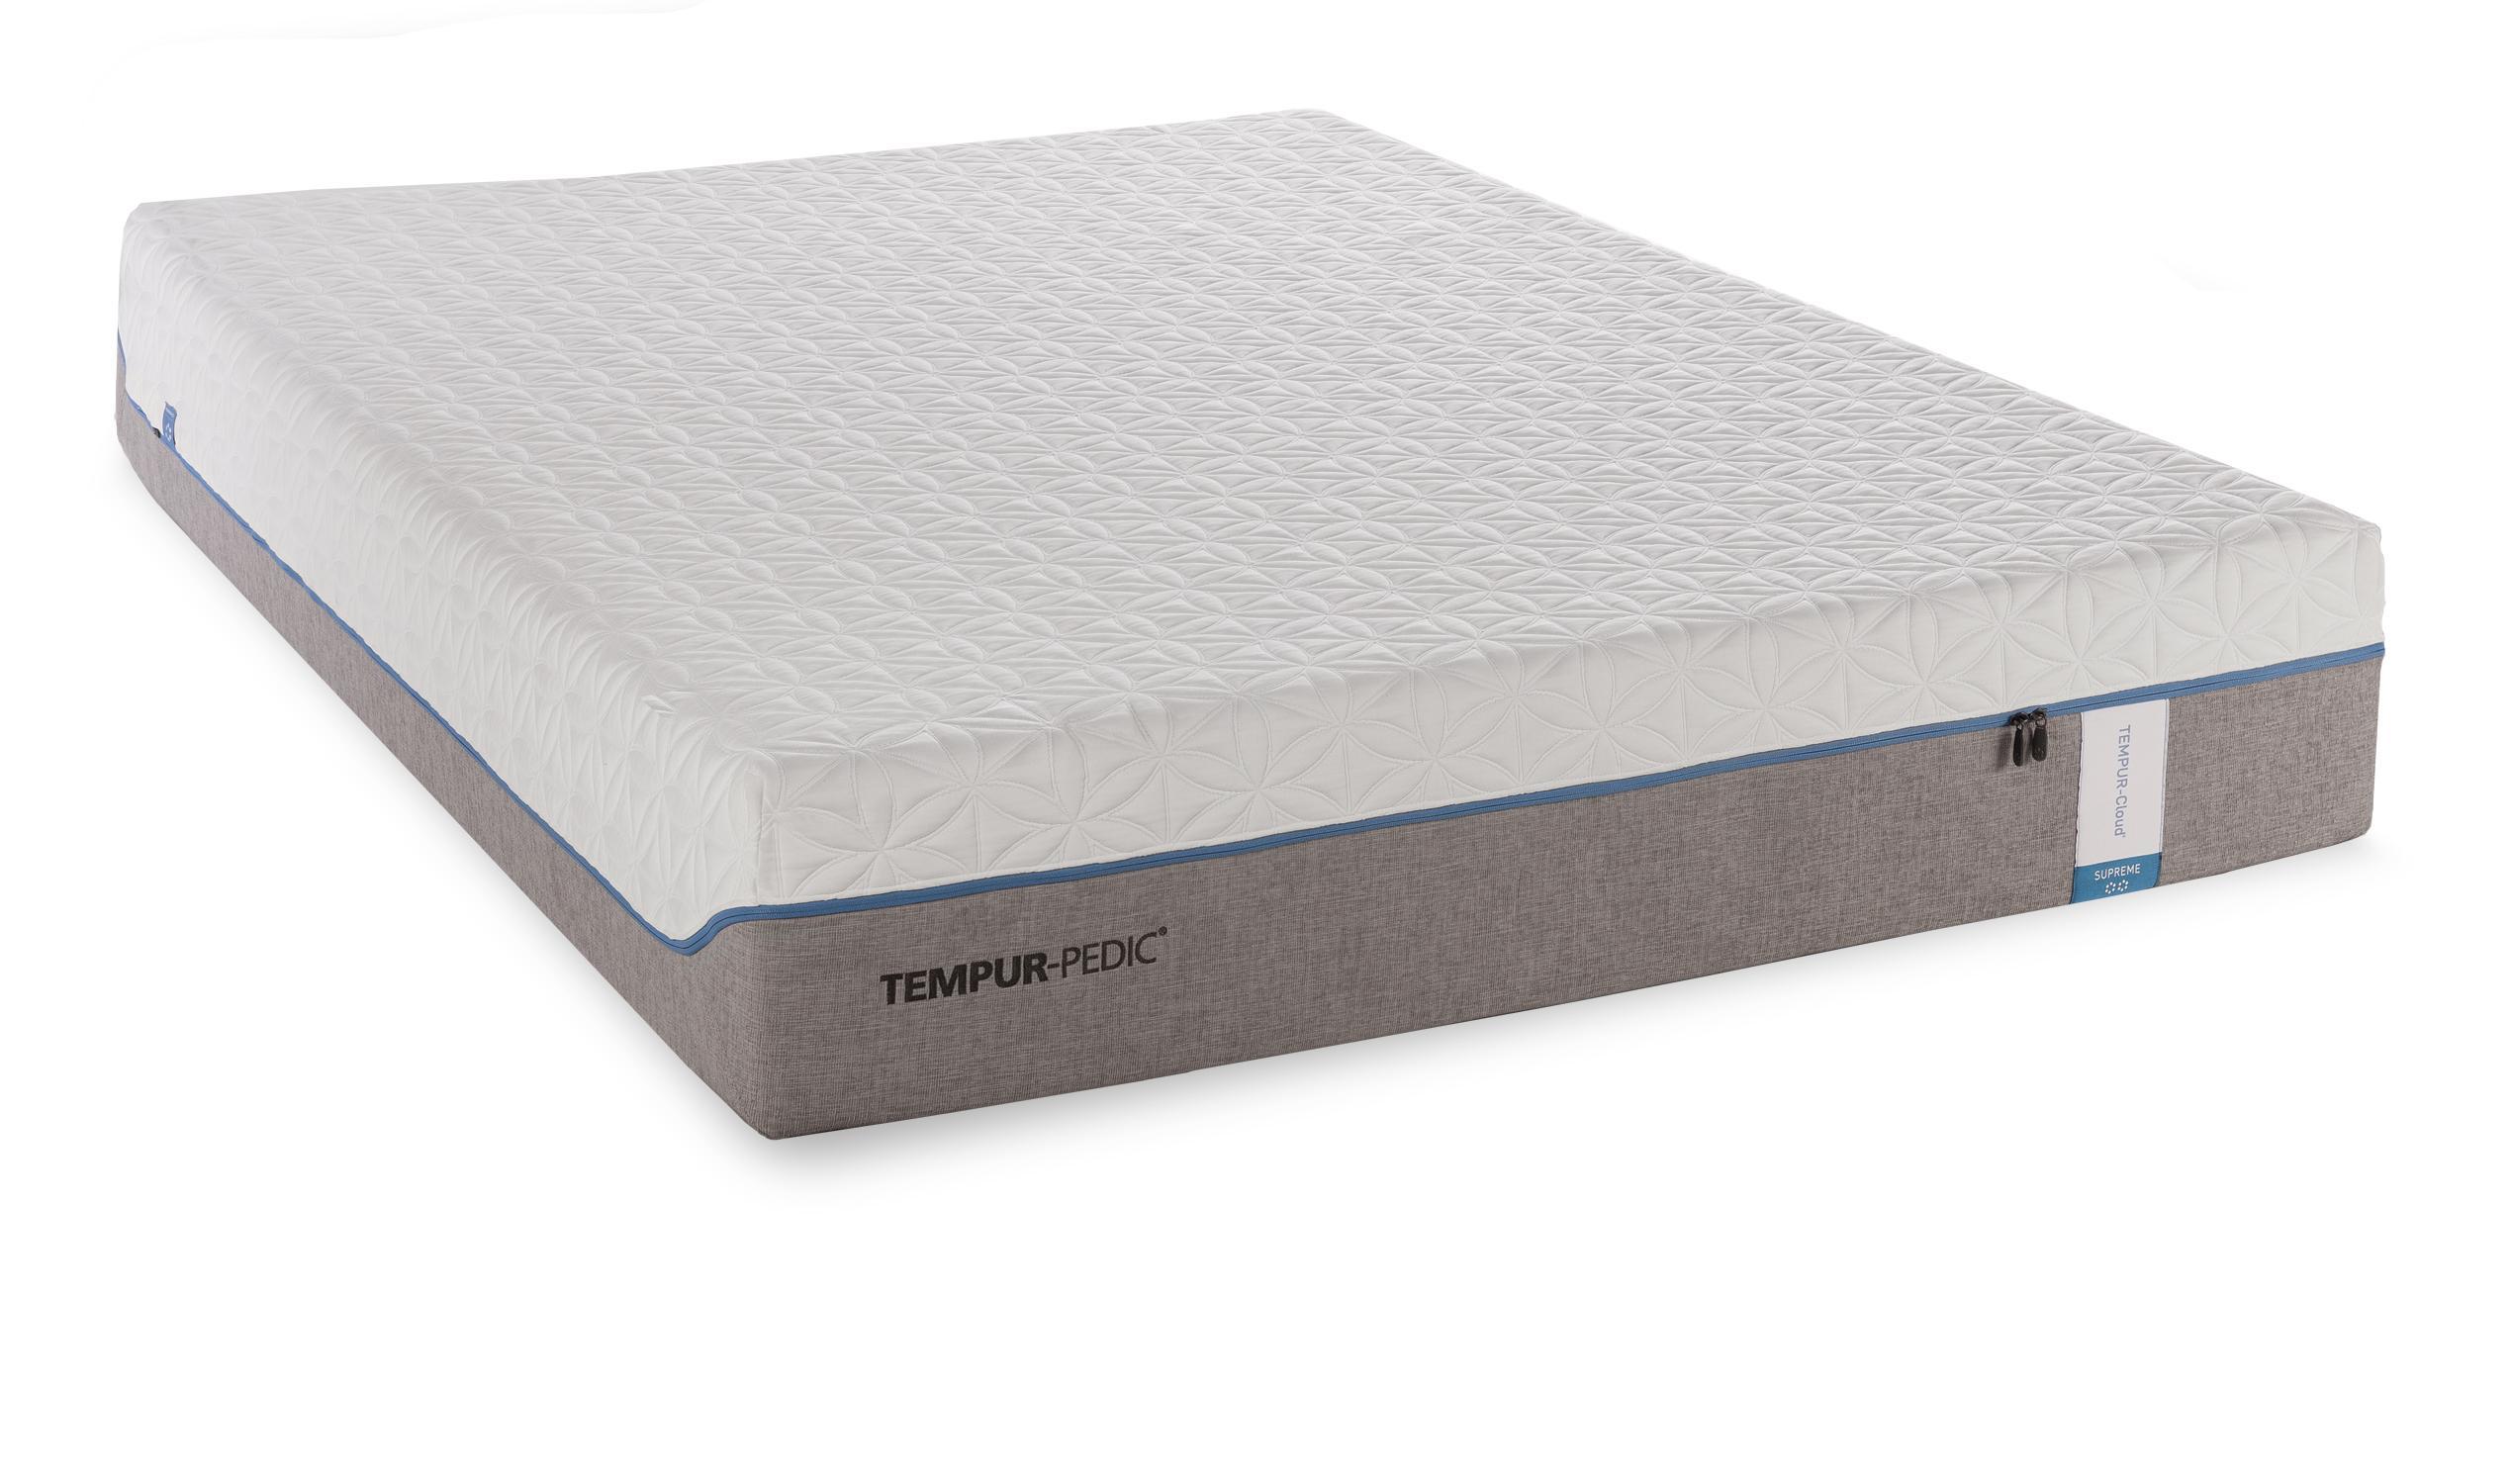 Tempur pedic tempur cloud supreme twin extra long soft for How long does a spring mattress last